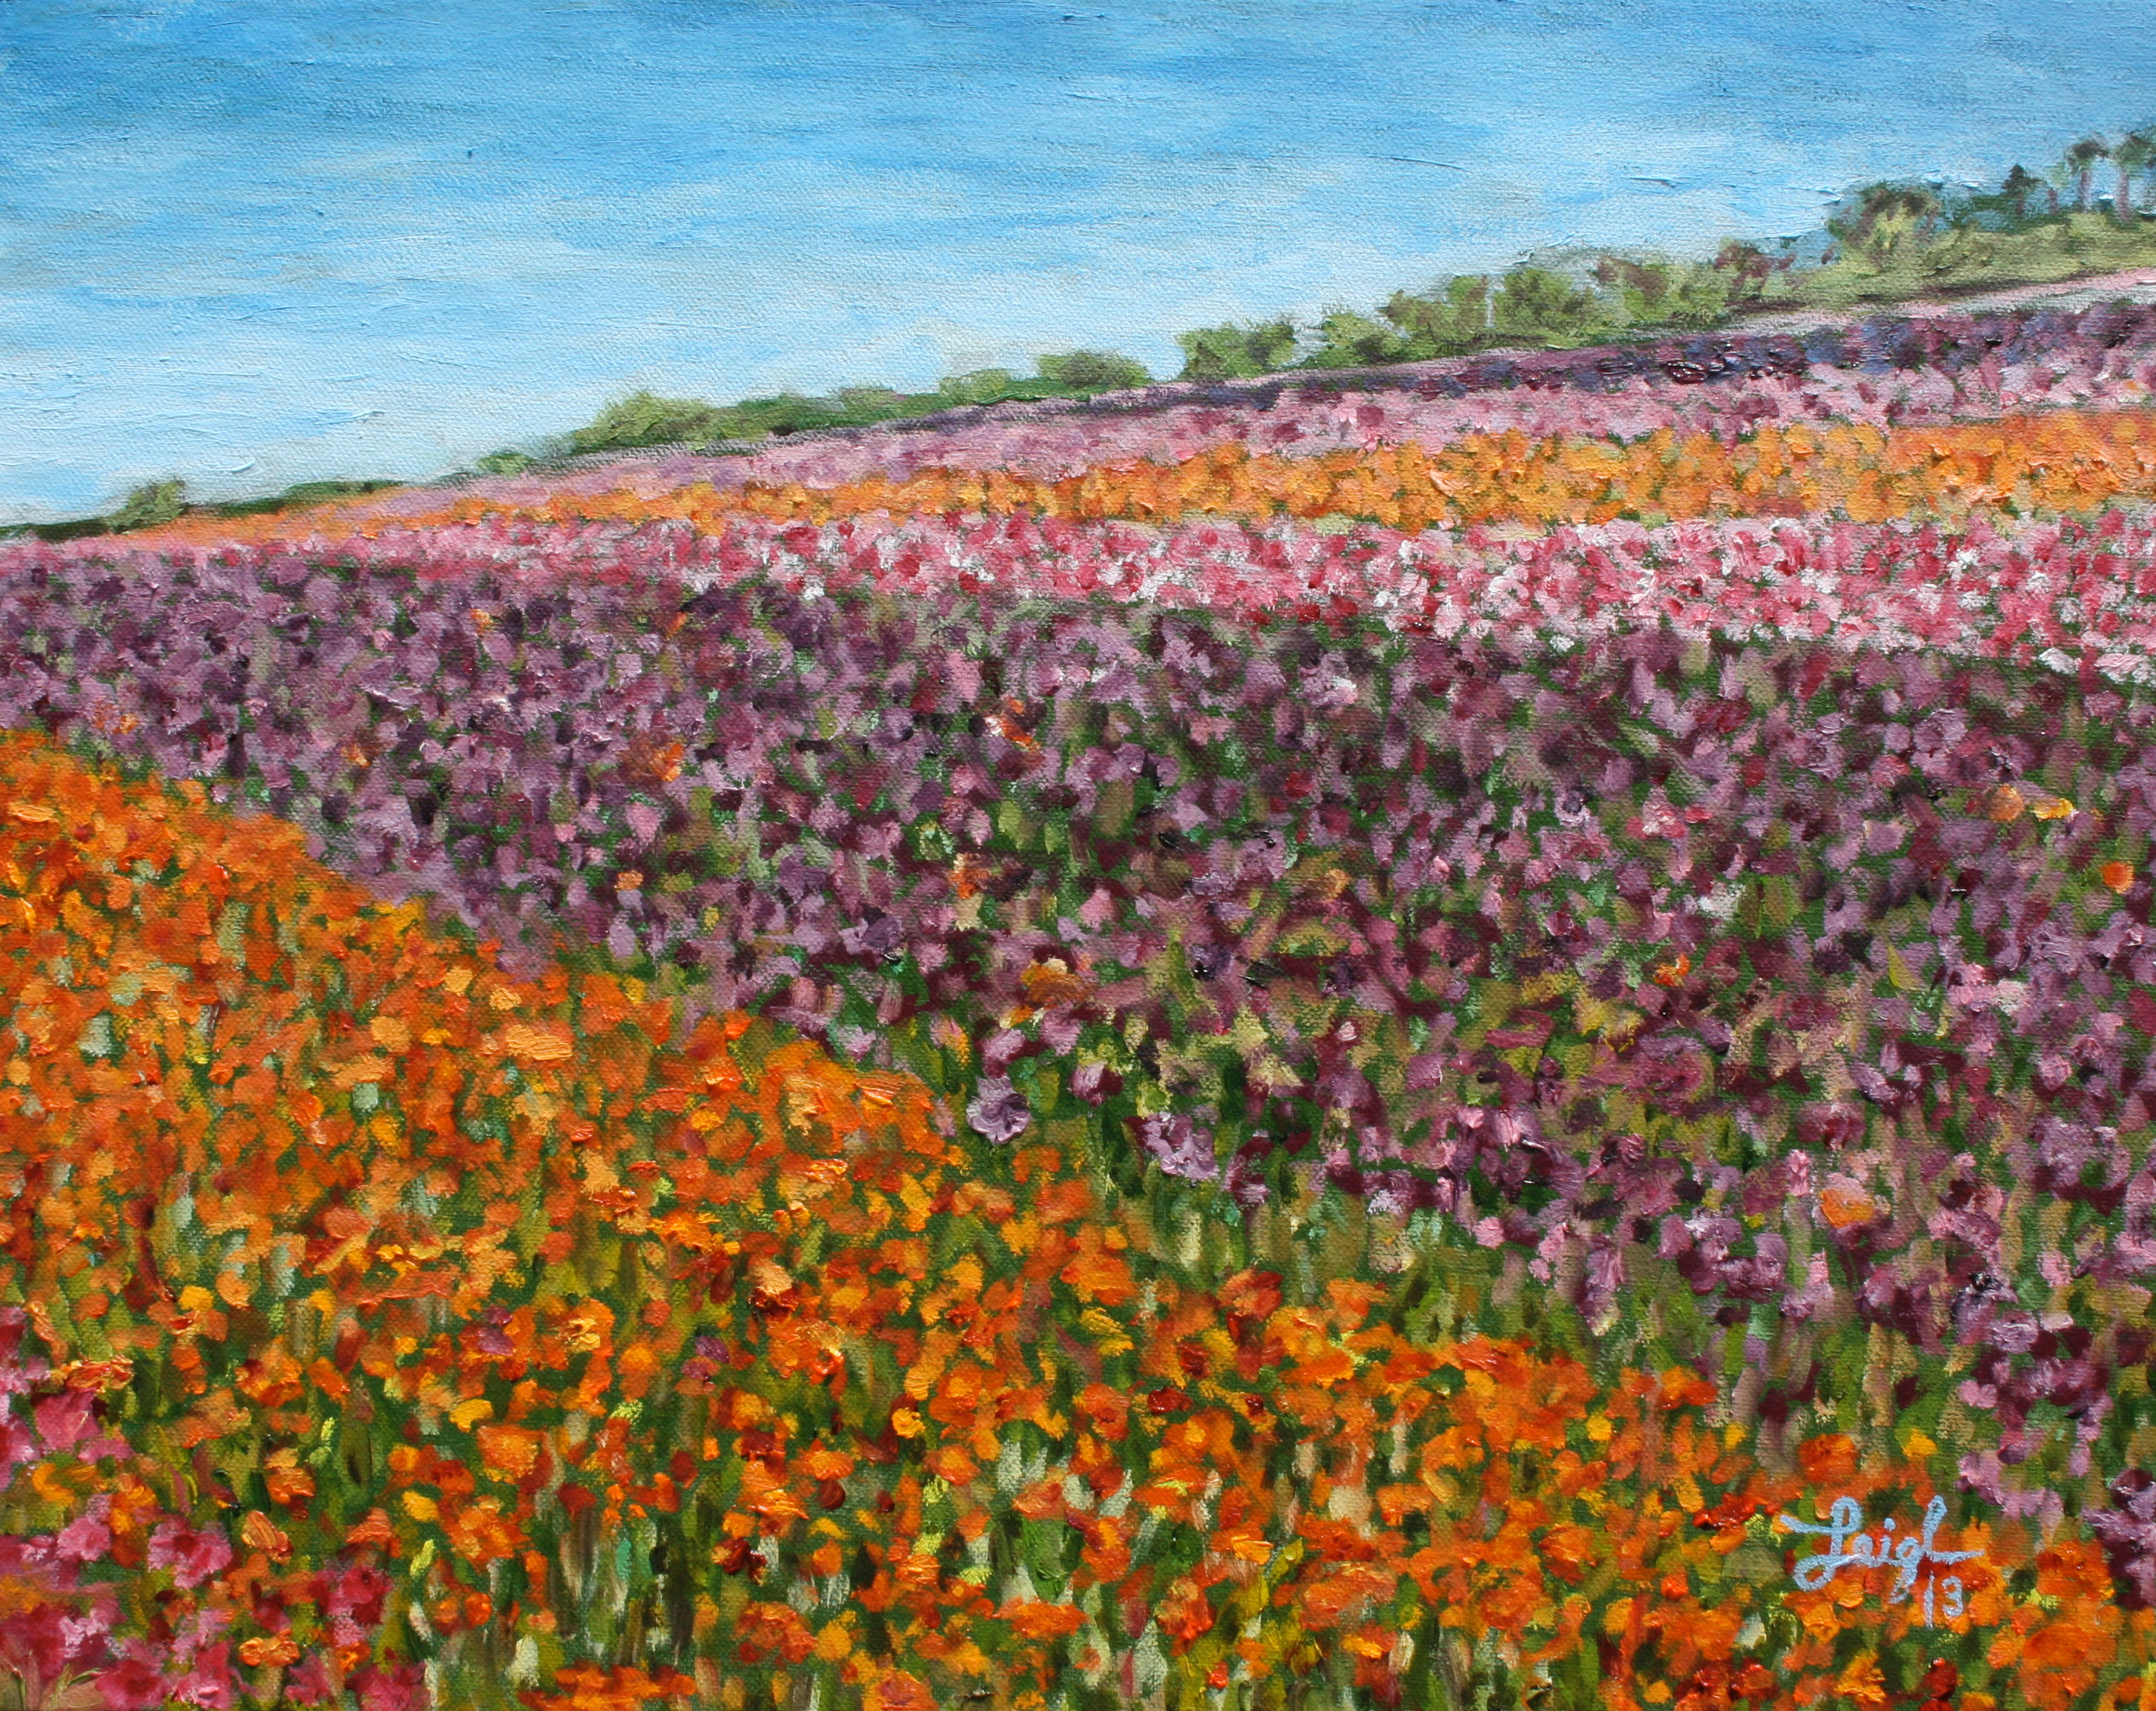 Carlsbad Flower Fields #1  ~   Martha Levine, Mt. Gretna, PA 2013  •  20 x 16